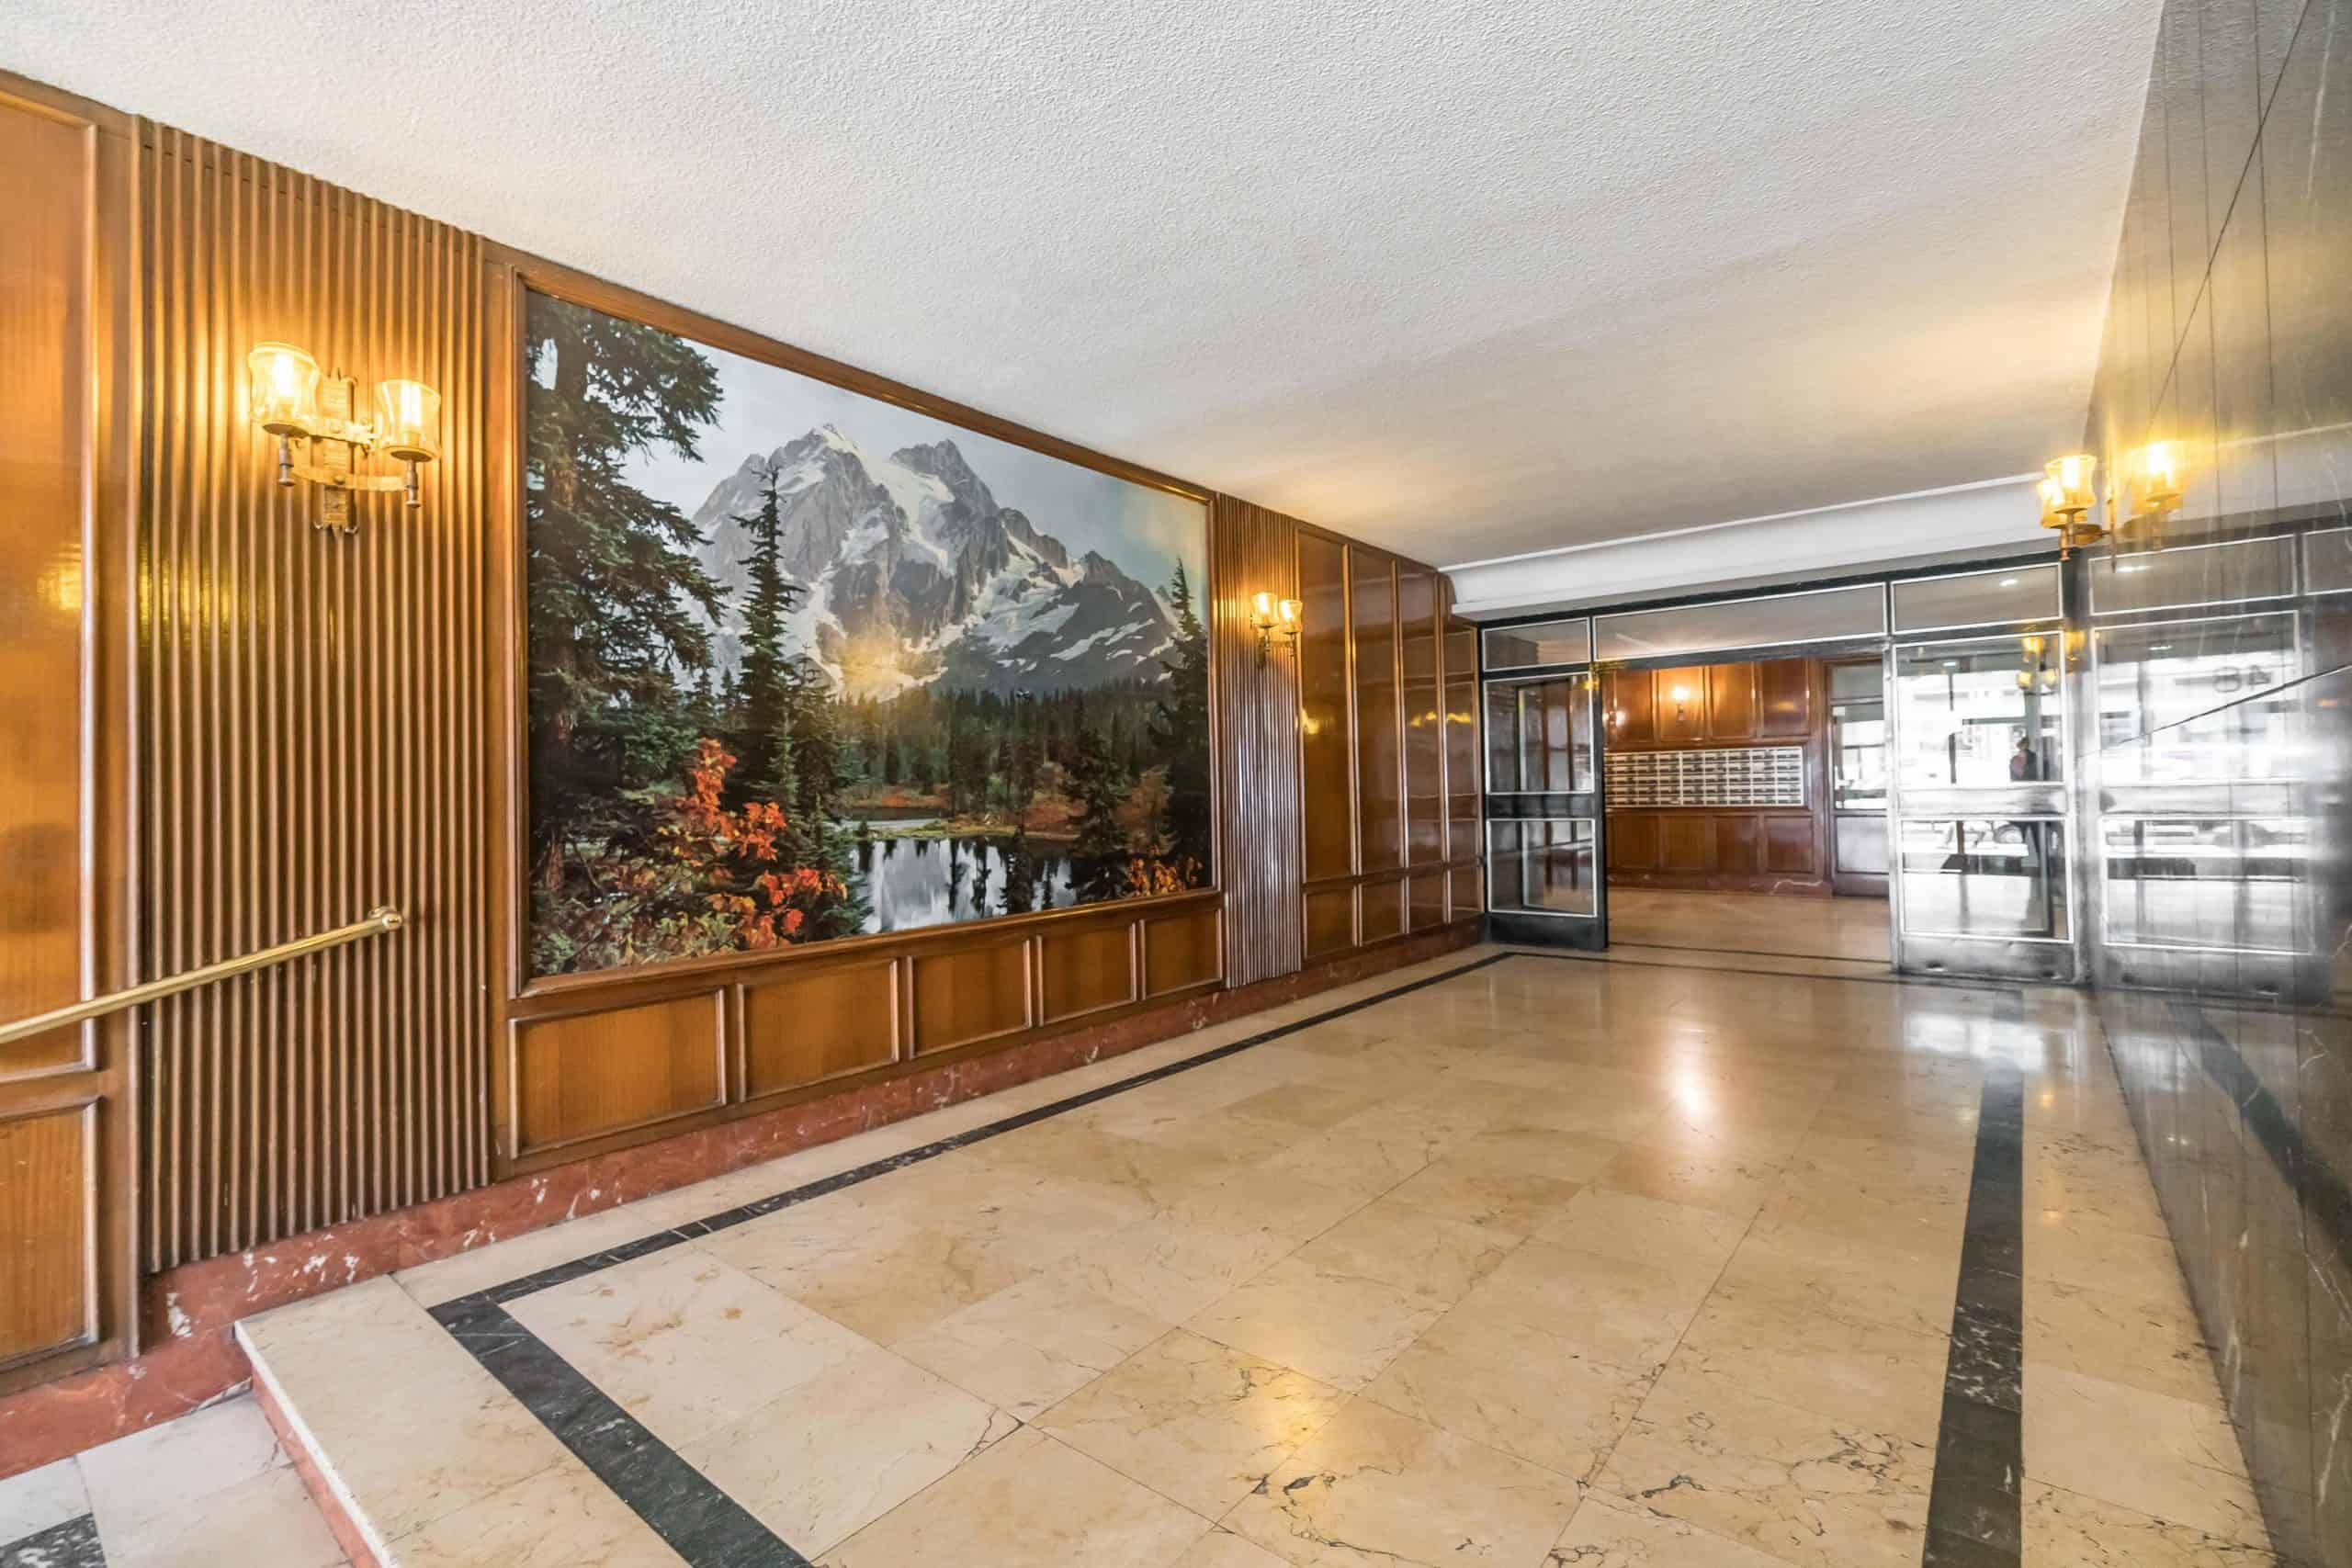 Agencia Inmobiliaria de Madrid-FUTUROCASA-Zona ARGANZUELA-LEGAZPI -calle Jaime Conquistador 48- Zonas Comunes 4